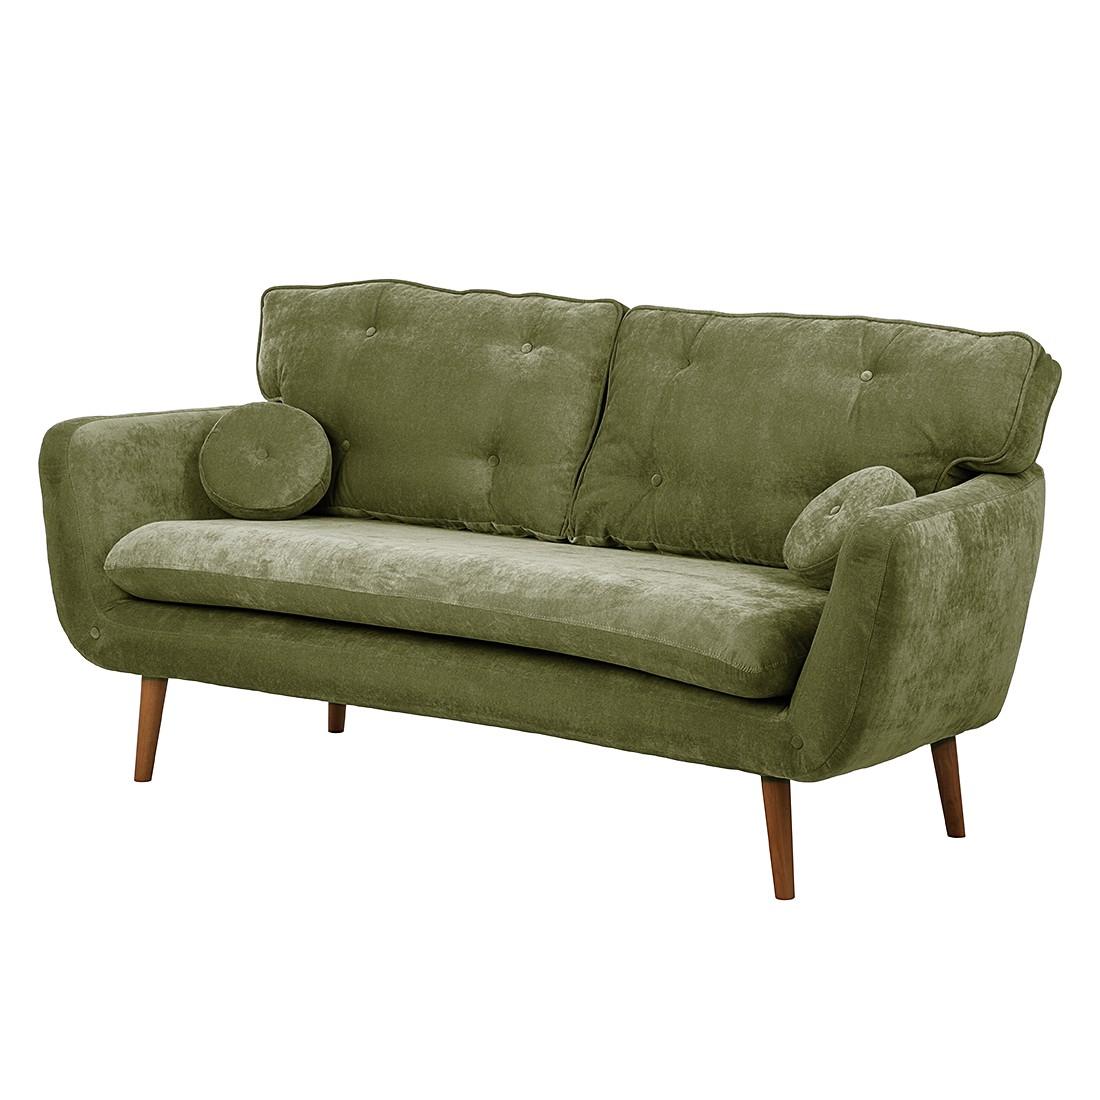 Sofa Lillbro (3-Sitzer) – Microfaser Grün, Mørteens jetzt kaufen